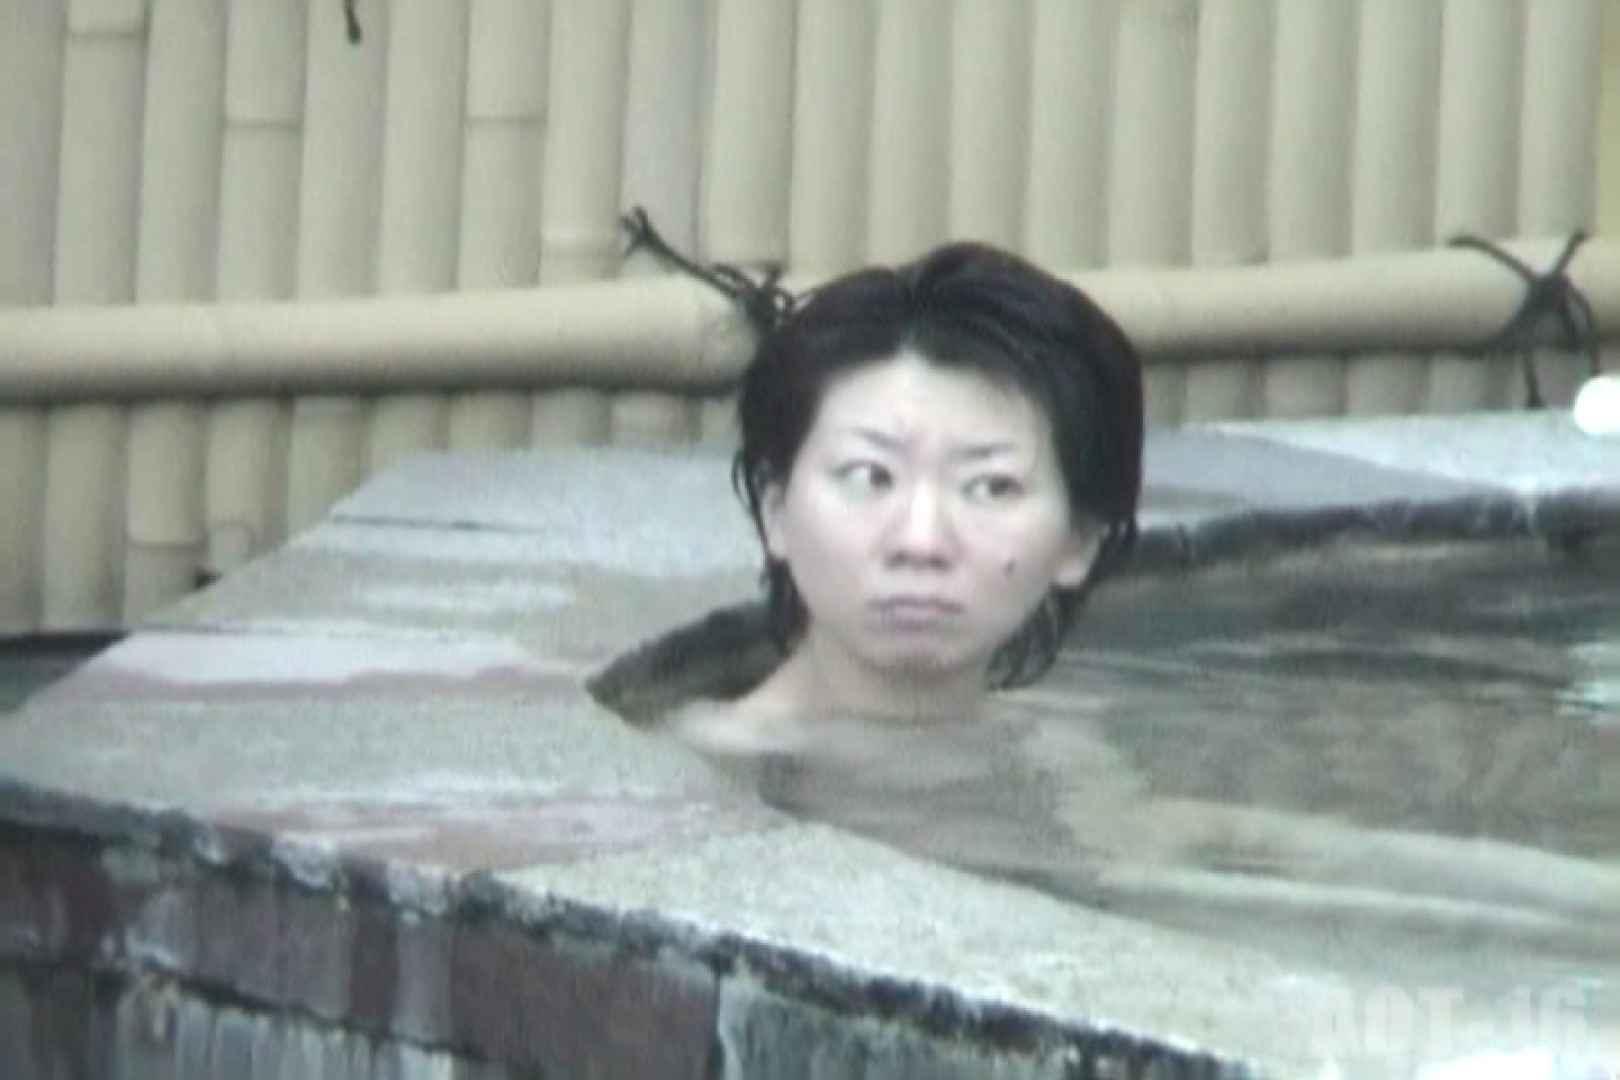 Aquaな露天風呂Vol.842 露天風呂突入 AV動画キャプチャ 96pic 5